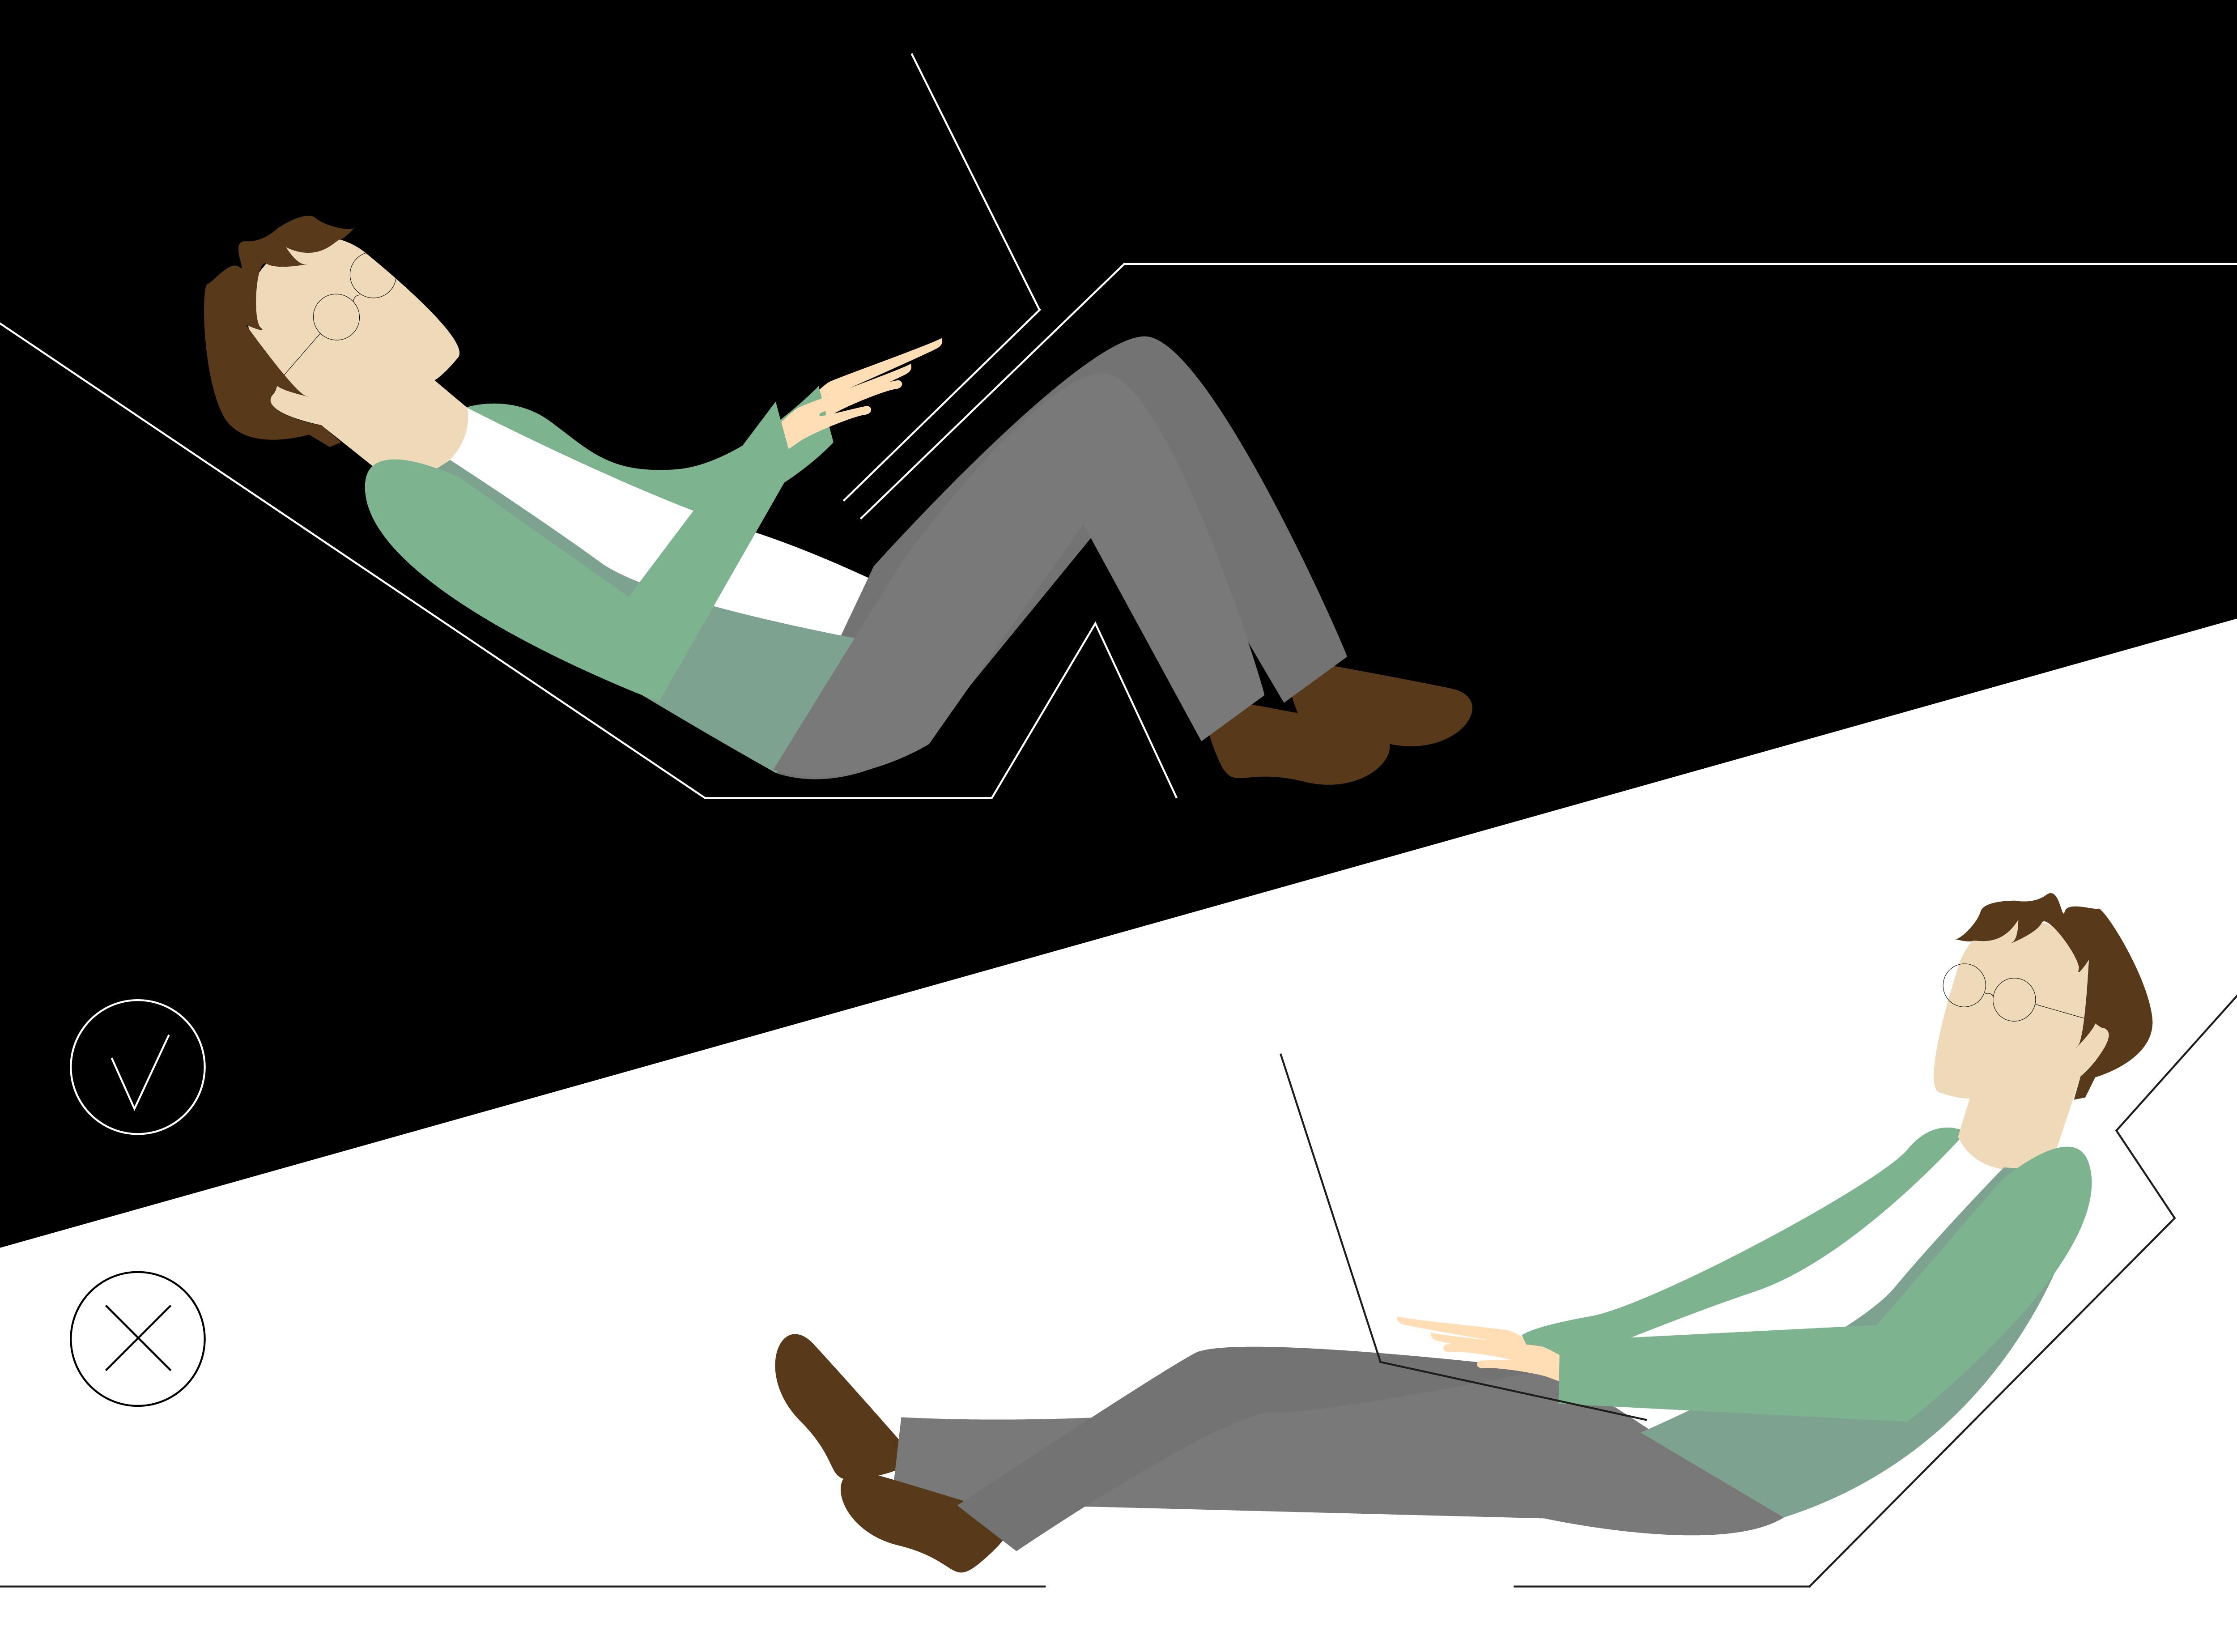 travailler allongé sans avoir mal au dos kamasutra jobasutra workasutra illustration par charlie la freelance